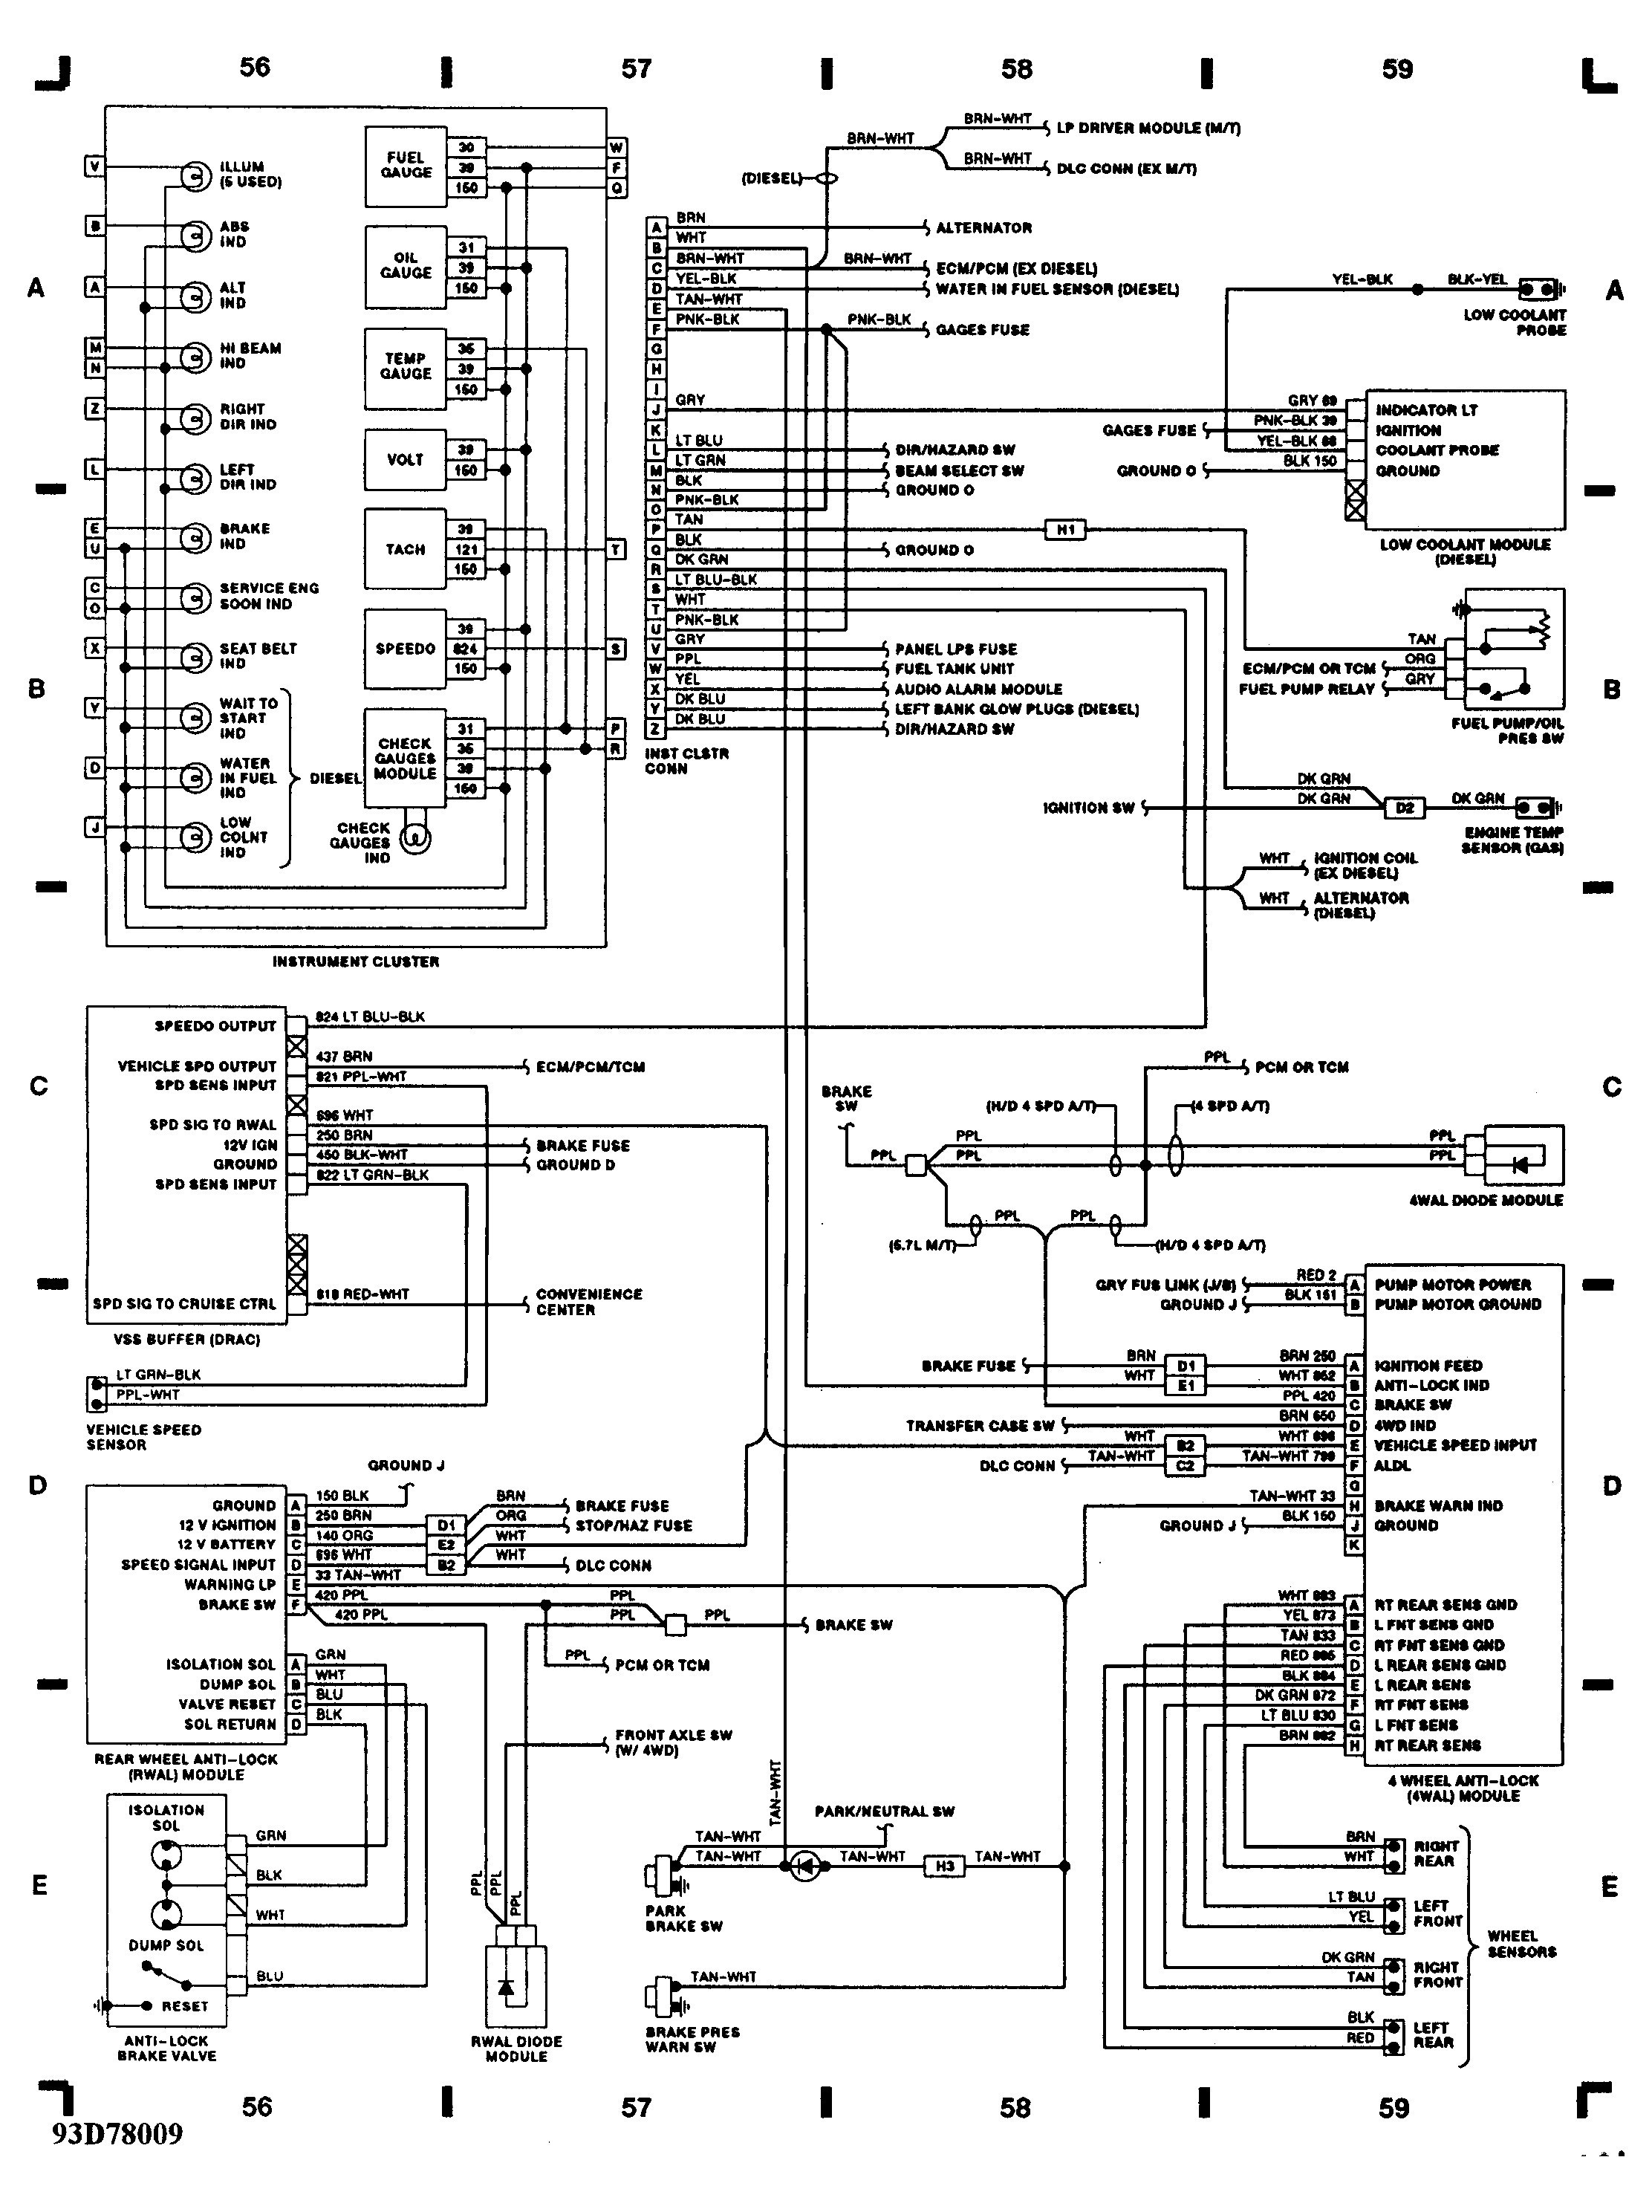 Remarkable Chevy Engine Wiring Basic Electronics Wiring Diagram Wiring Cloud Uslyletkolfr09Org